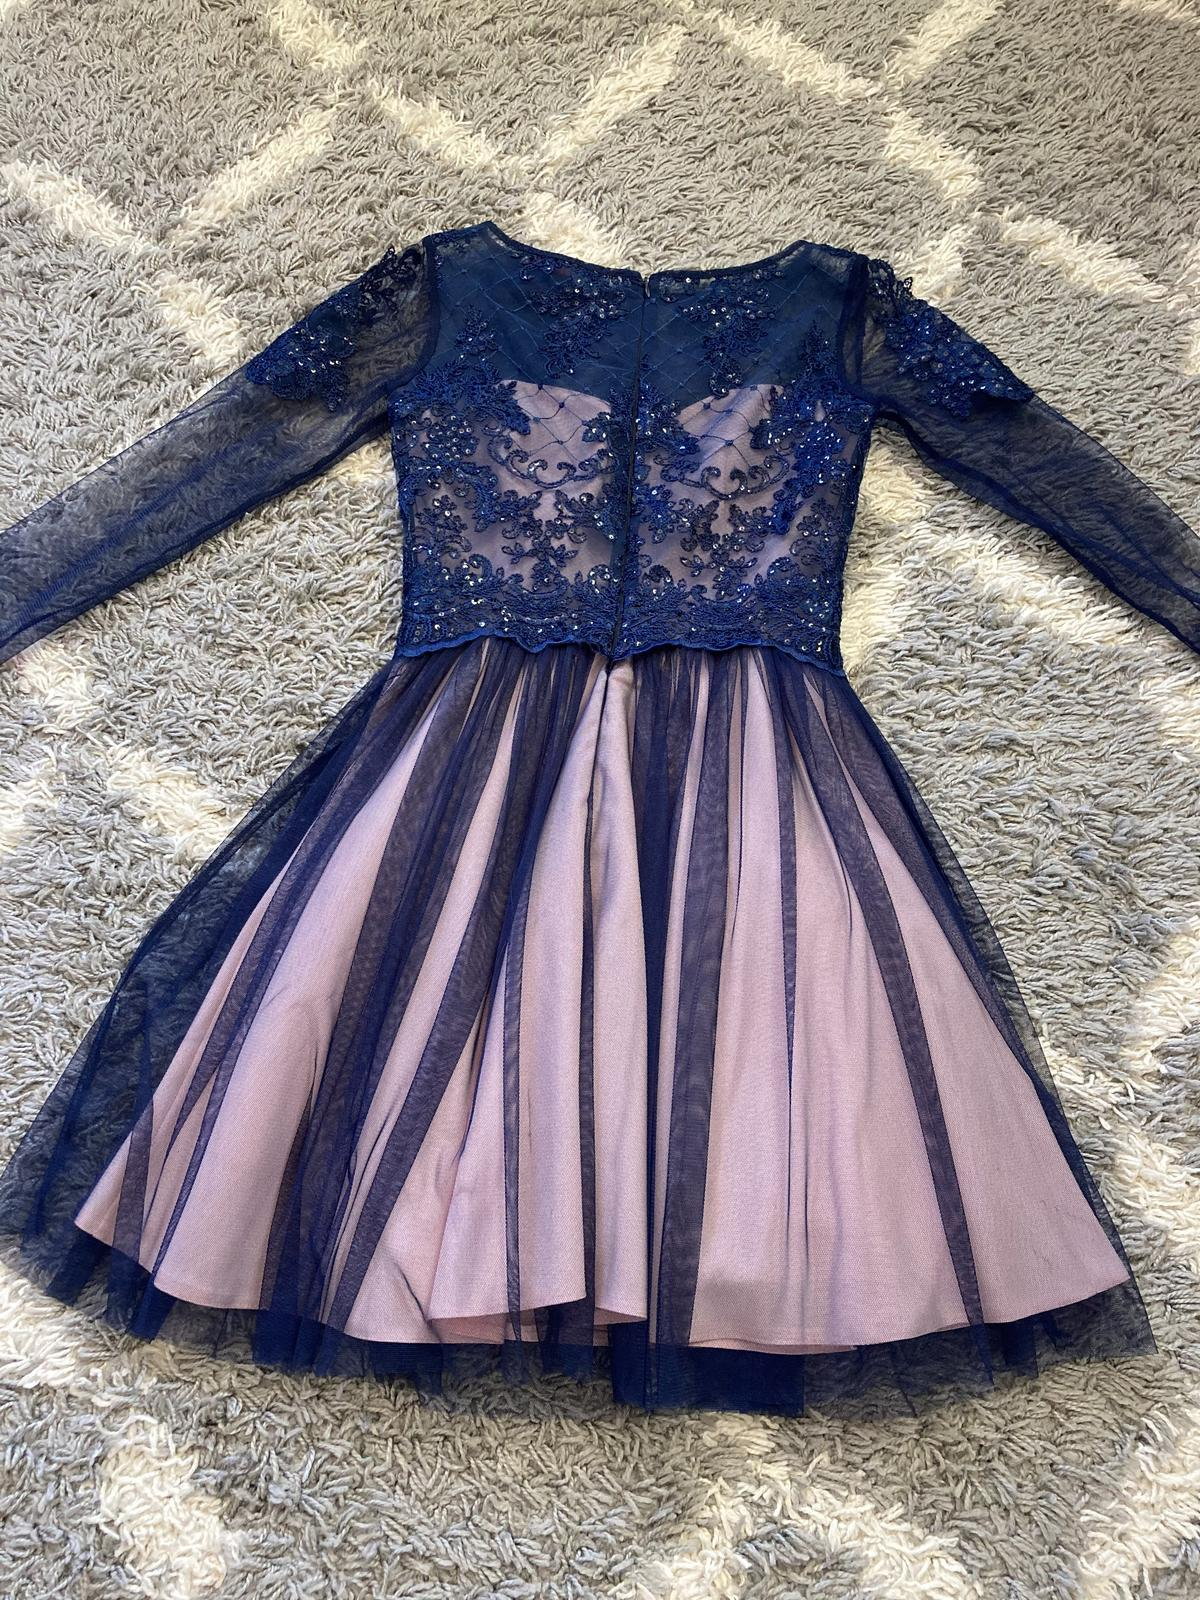 Elegantne šaty 36 - Obrázok č. 3